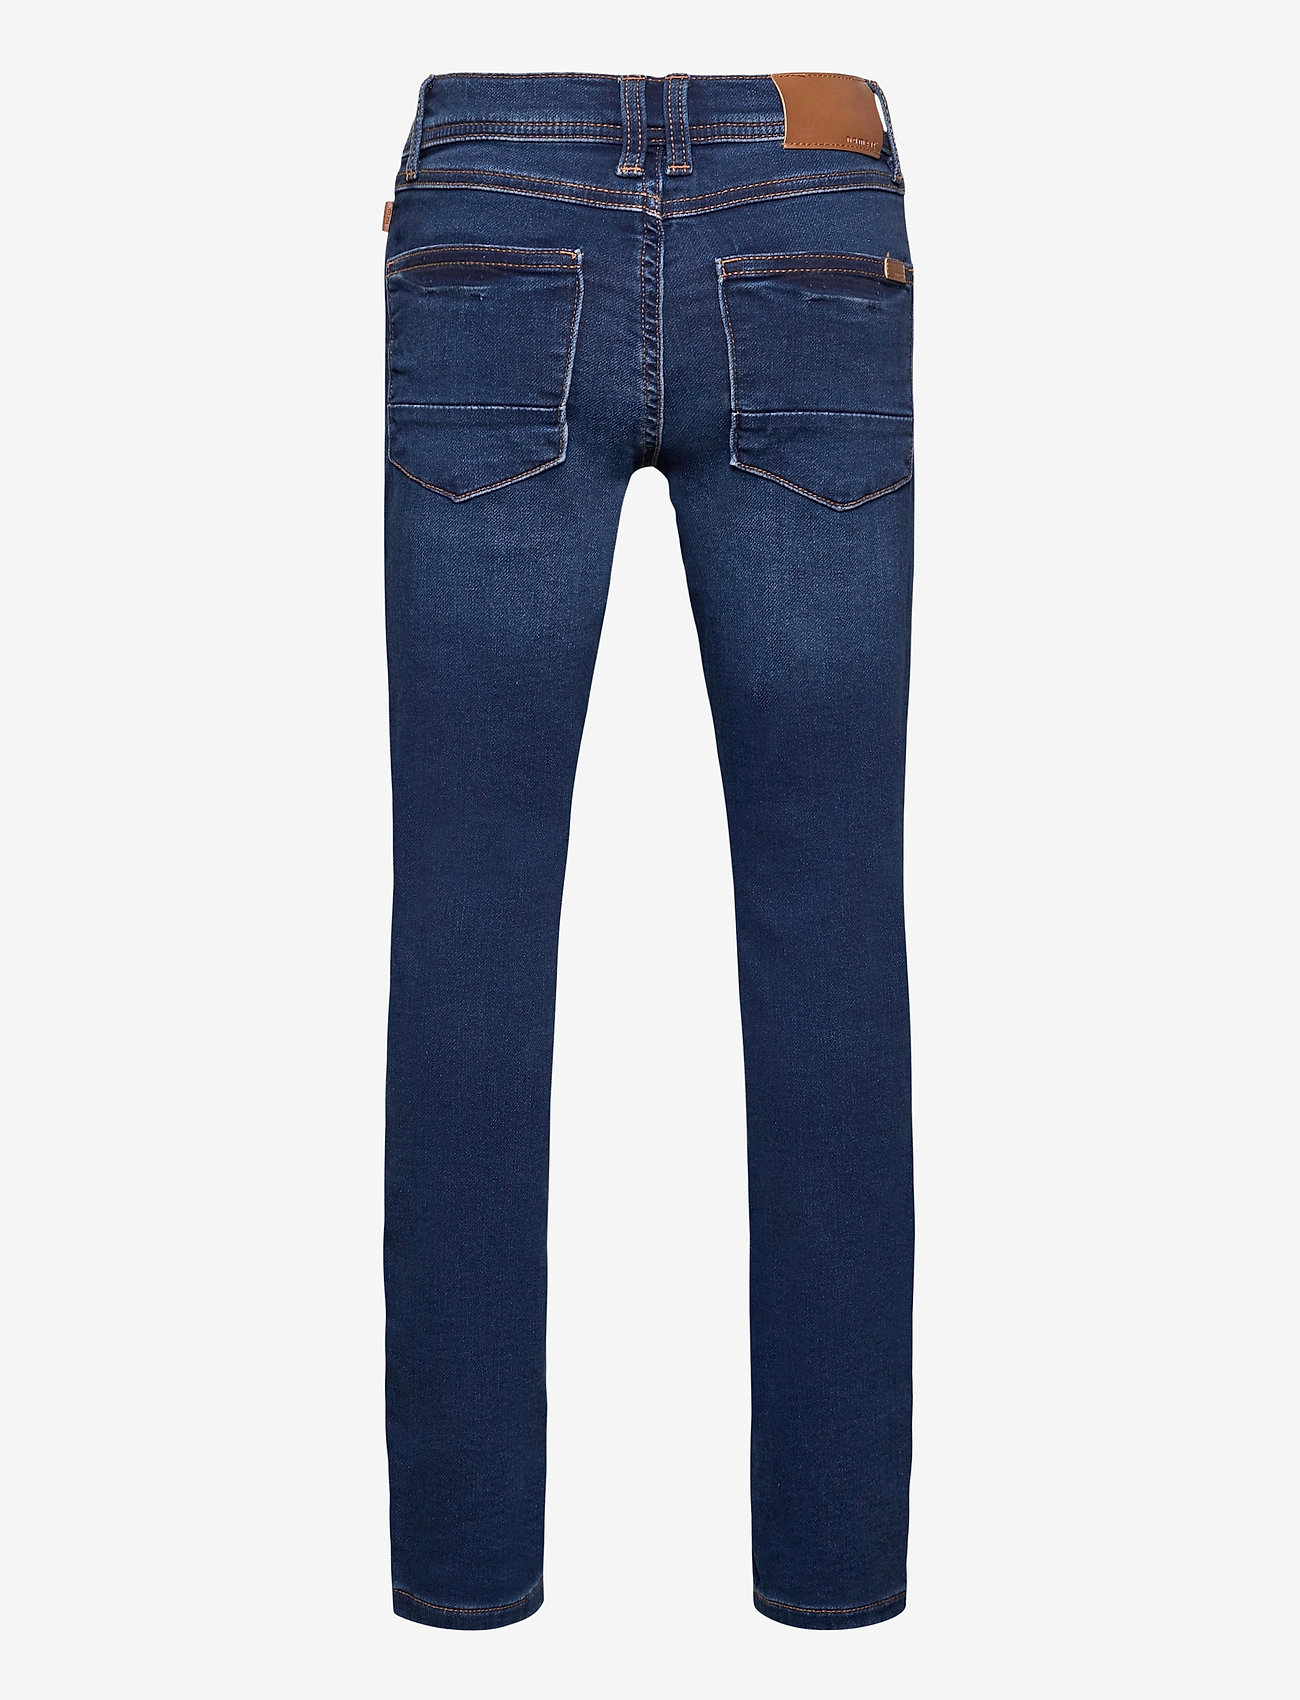 name it - NKMTHEO DNMTIMES 3470 SWE PANT NOOS - jeans - dark blue denim - 1